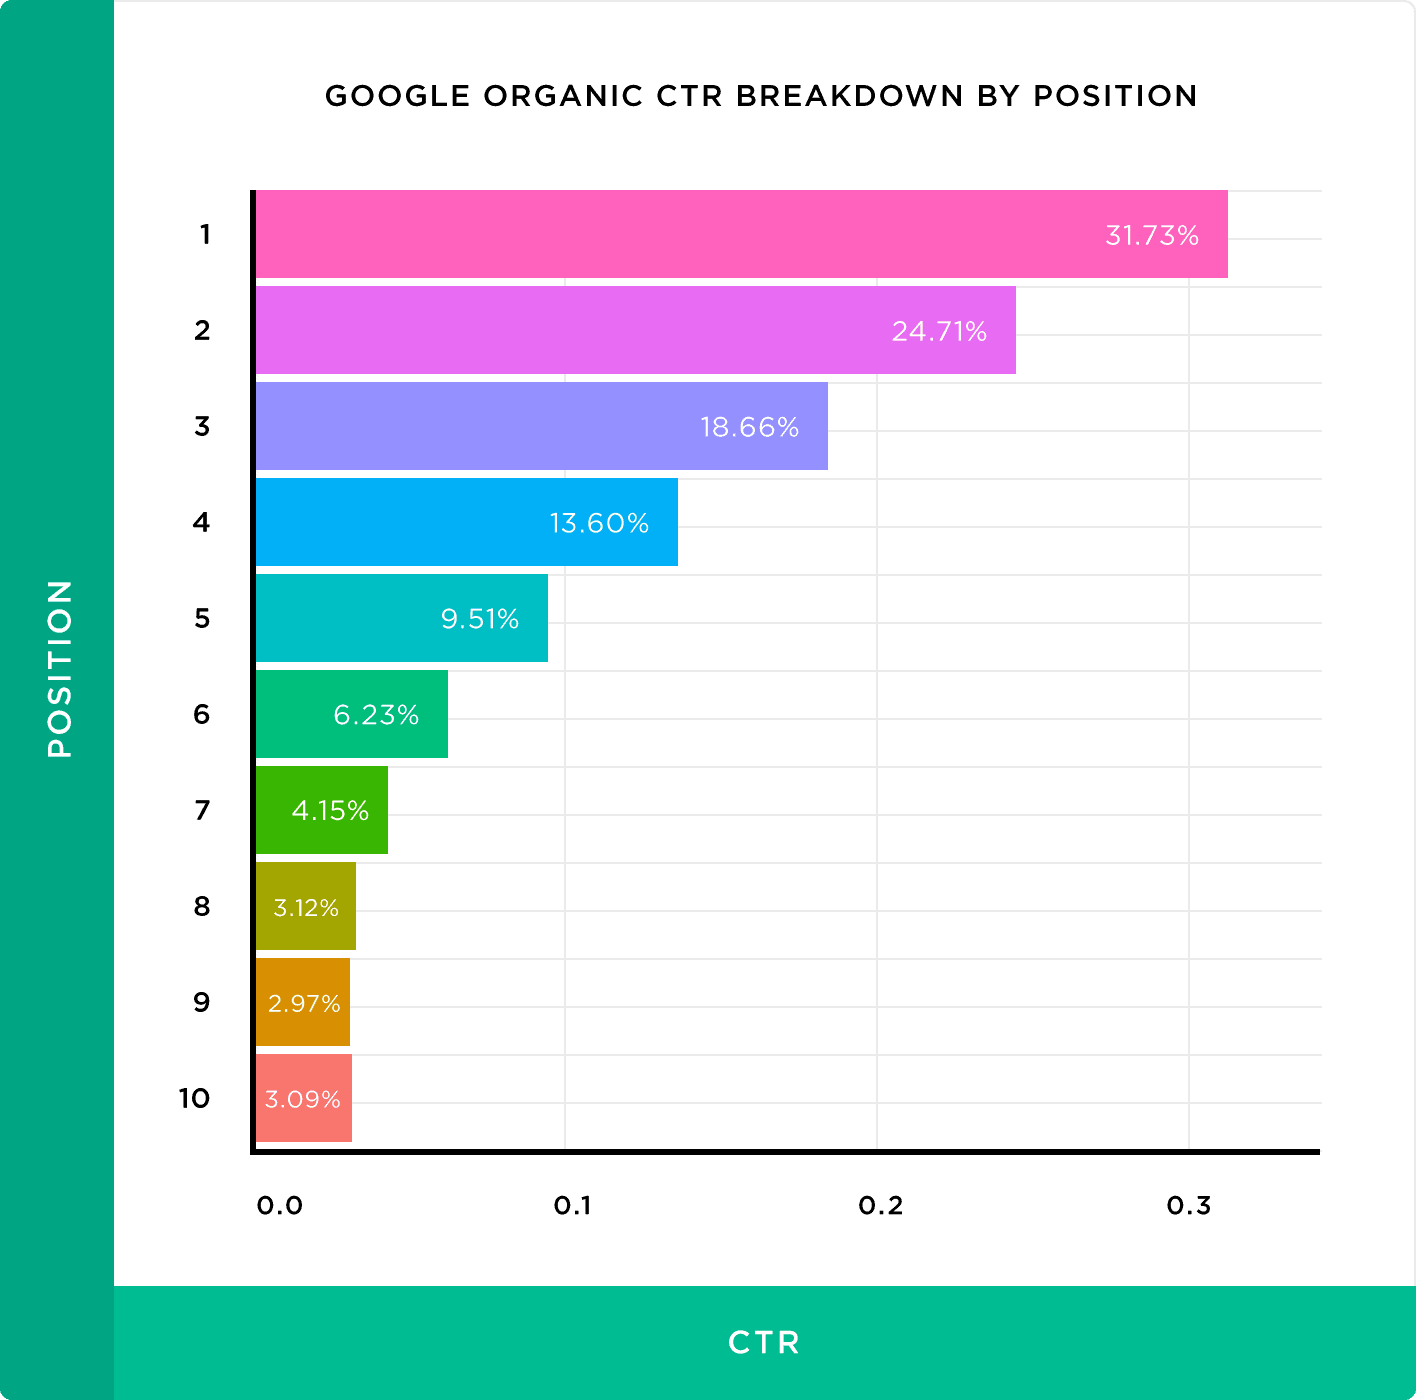 Organic CTR